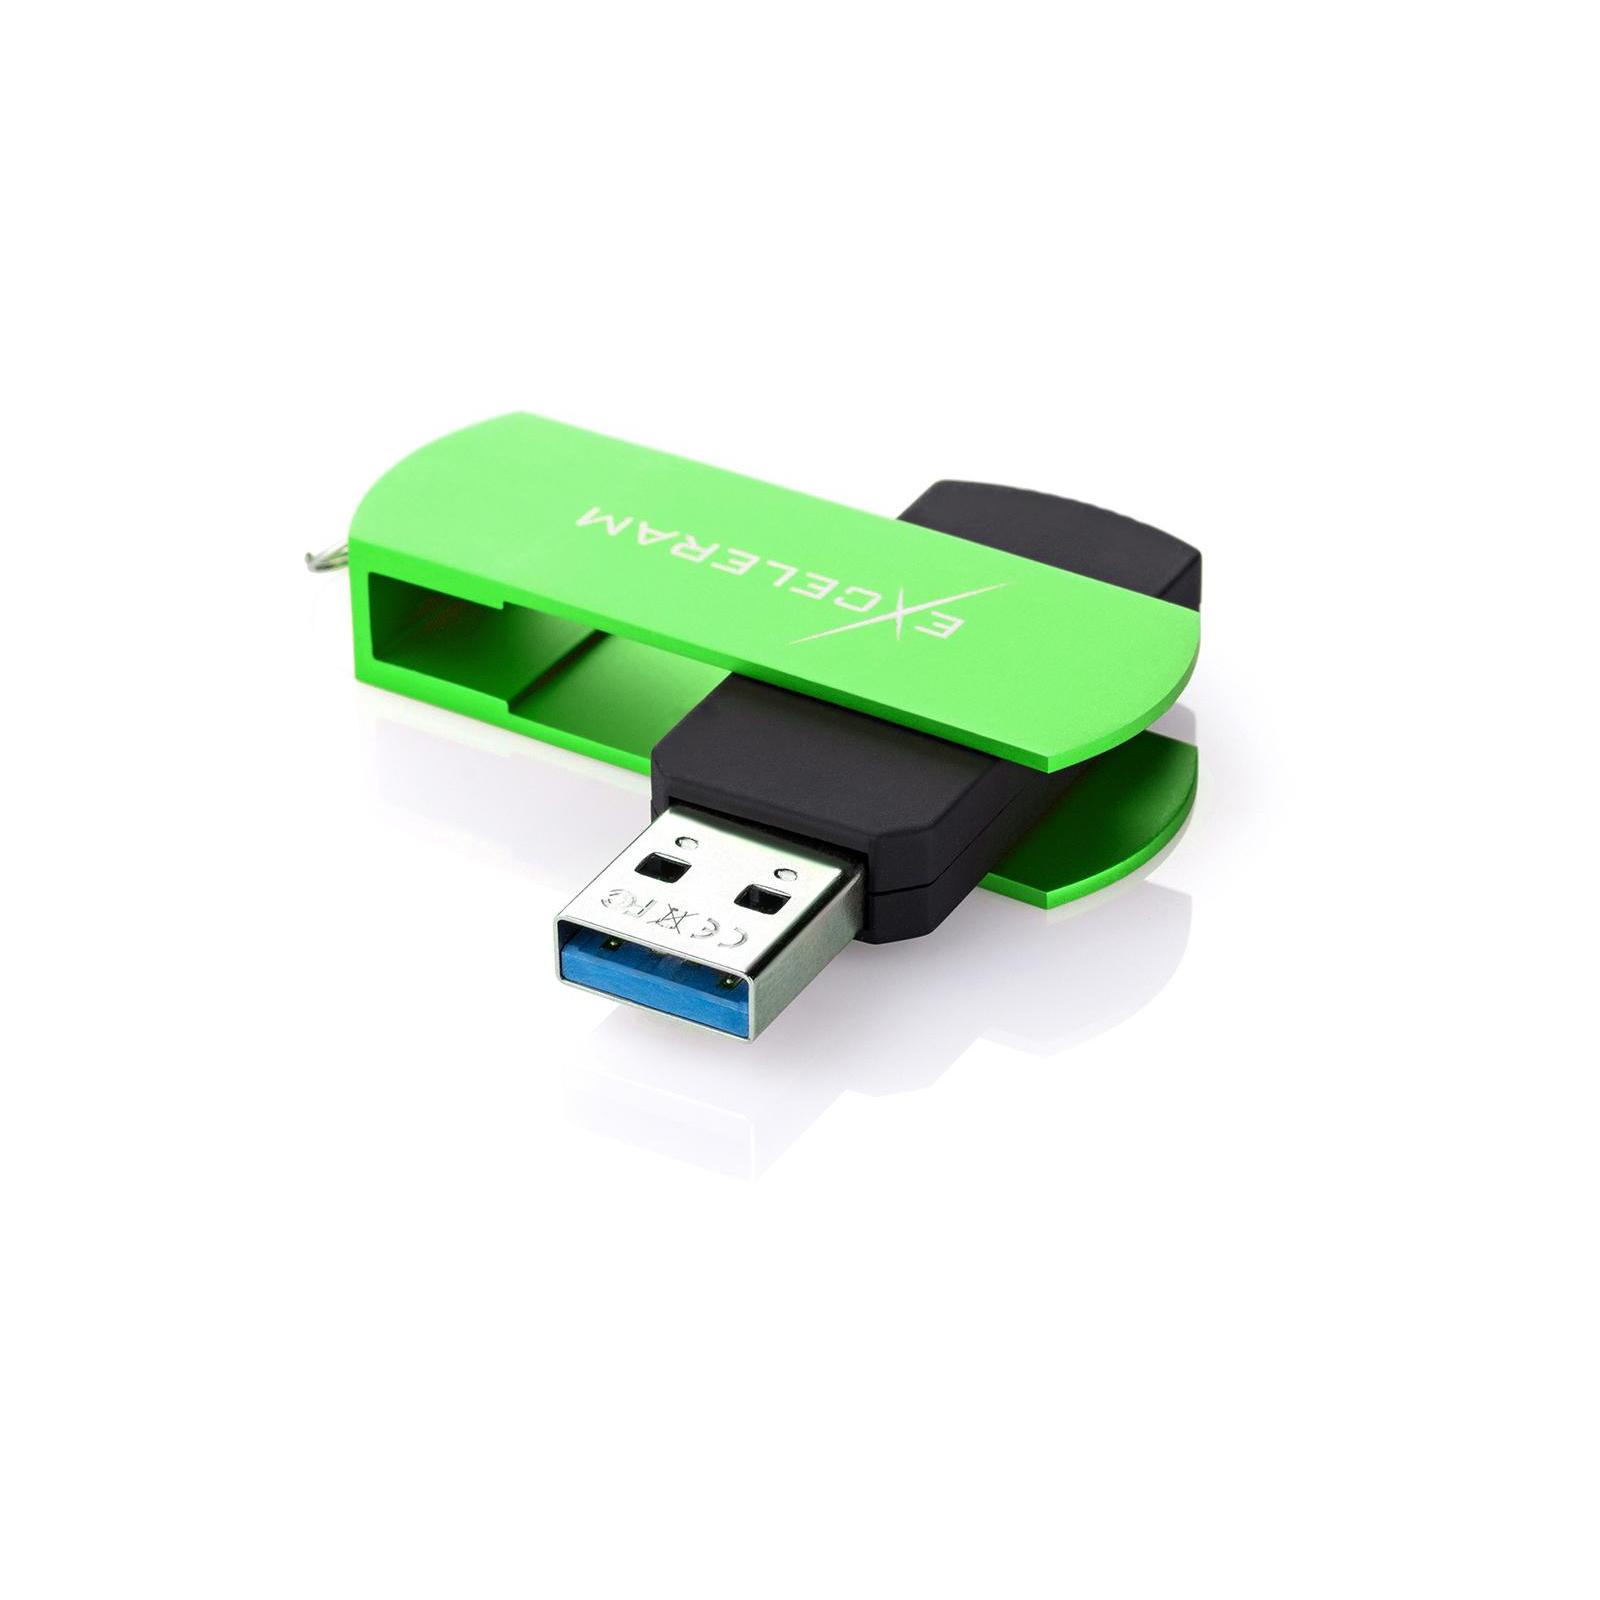 USB флеш накопитель eXceleram 32GB P2 Series Blue/Black USB 3.1 Gen 1 (EXP2U3BLB32) изображение 2